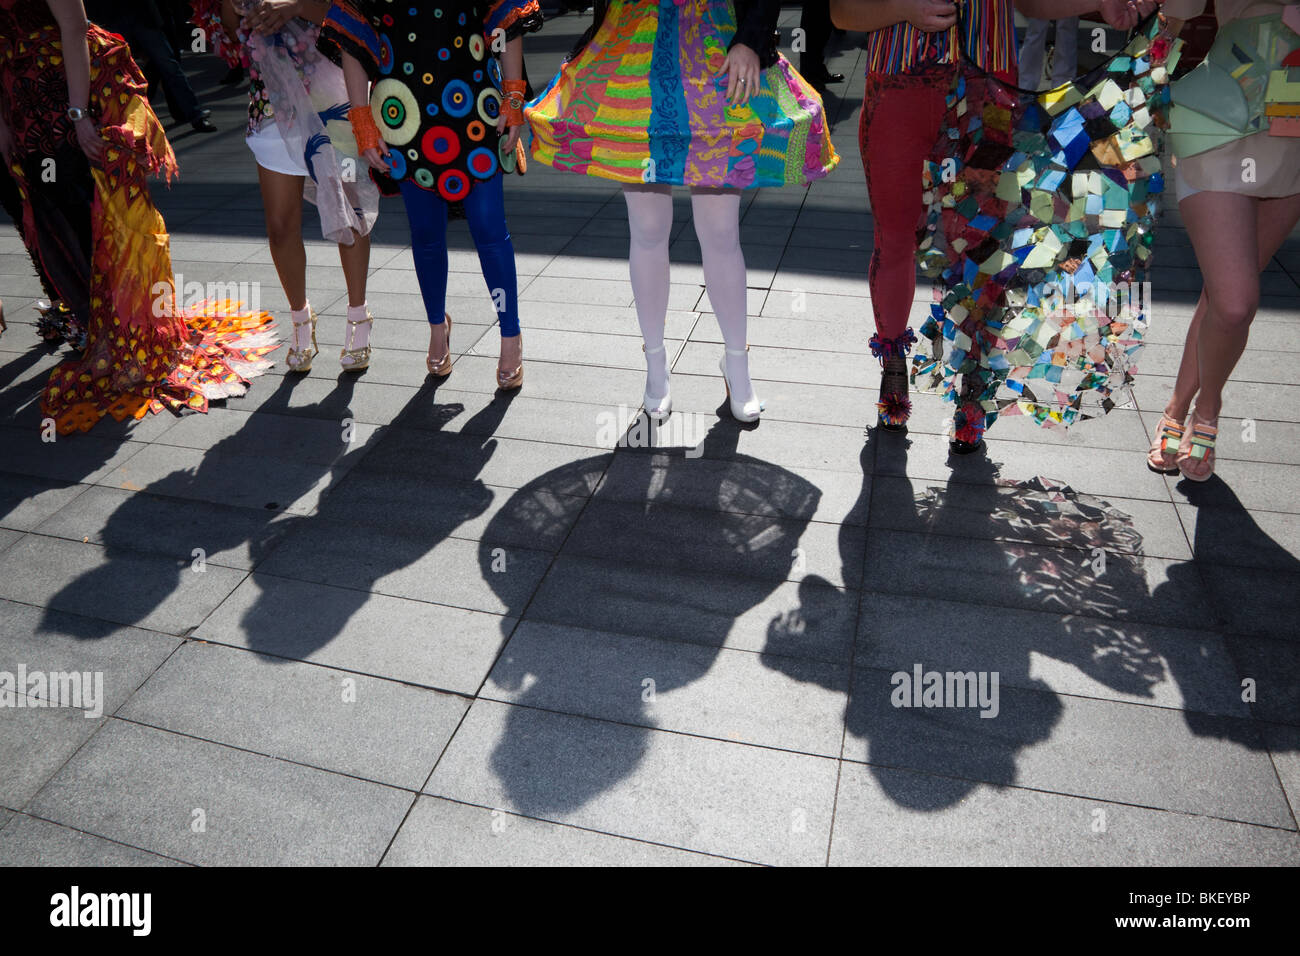 Schatten der Fashion-Modelle auf Asphalt, Alternative Fashion Week, Spitalfields Market, London, England, UK Stockbild